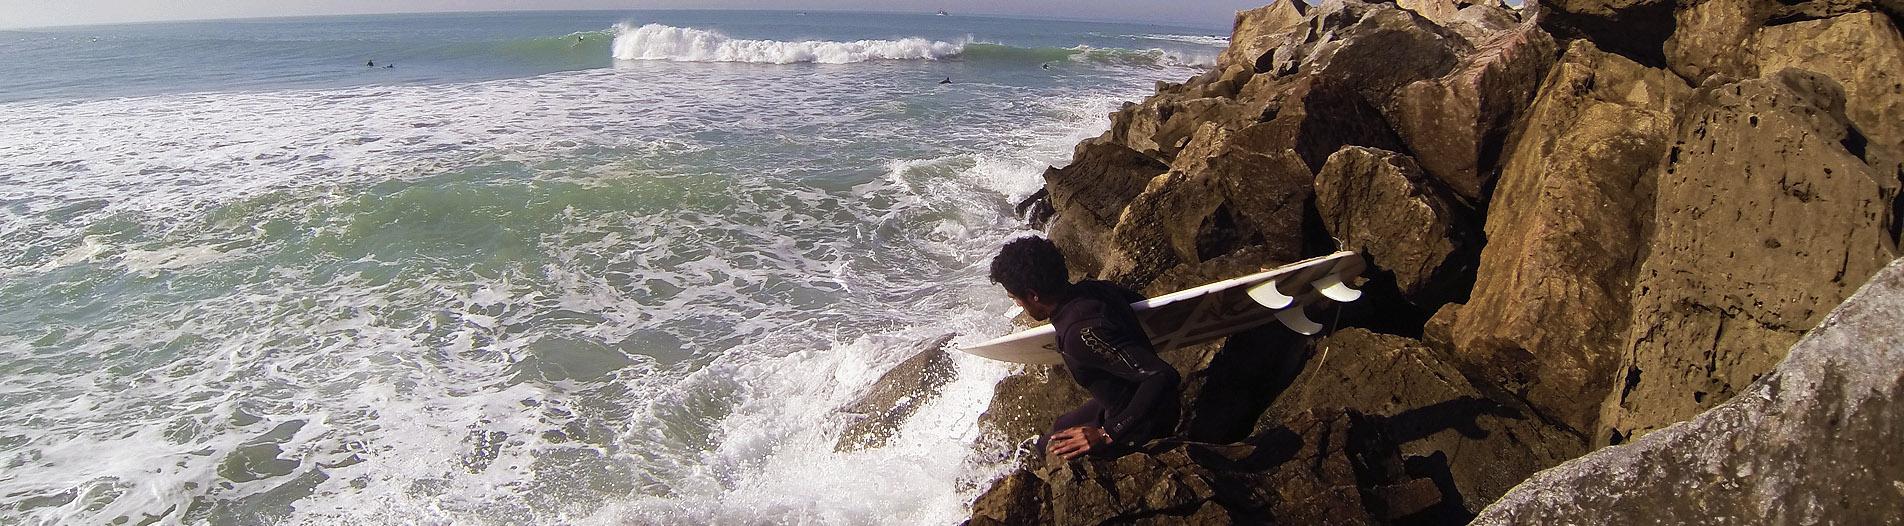 Surf Medhia